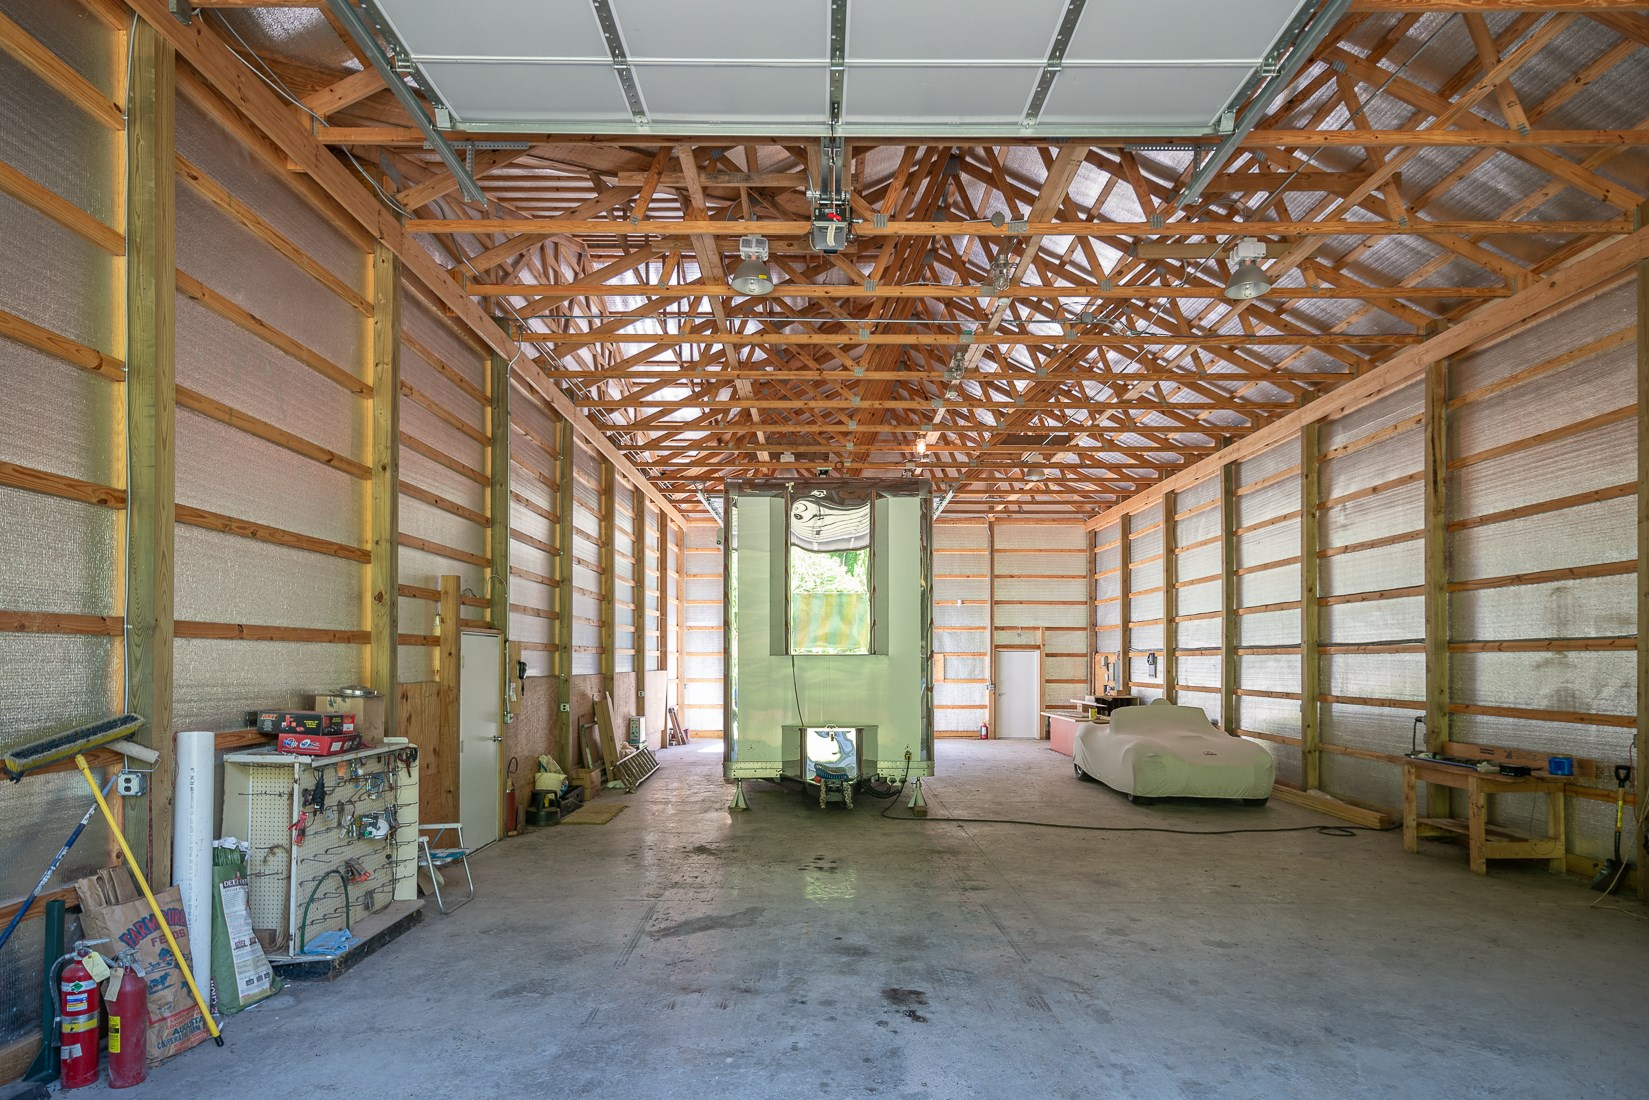 Interior of the RV barn